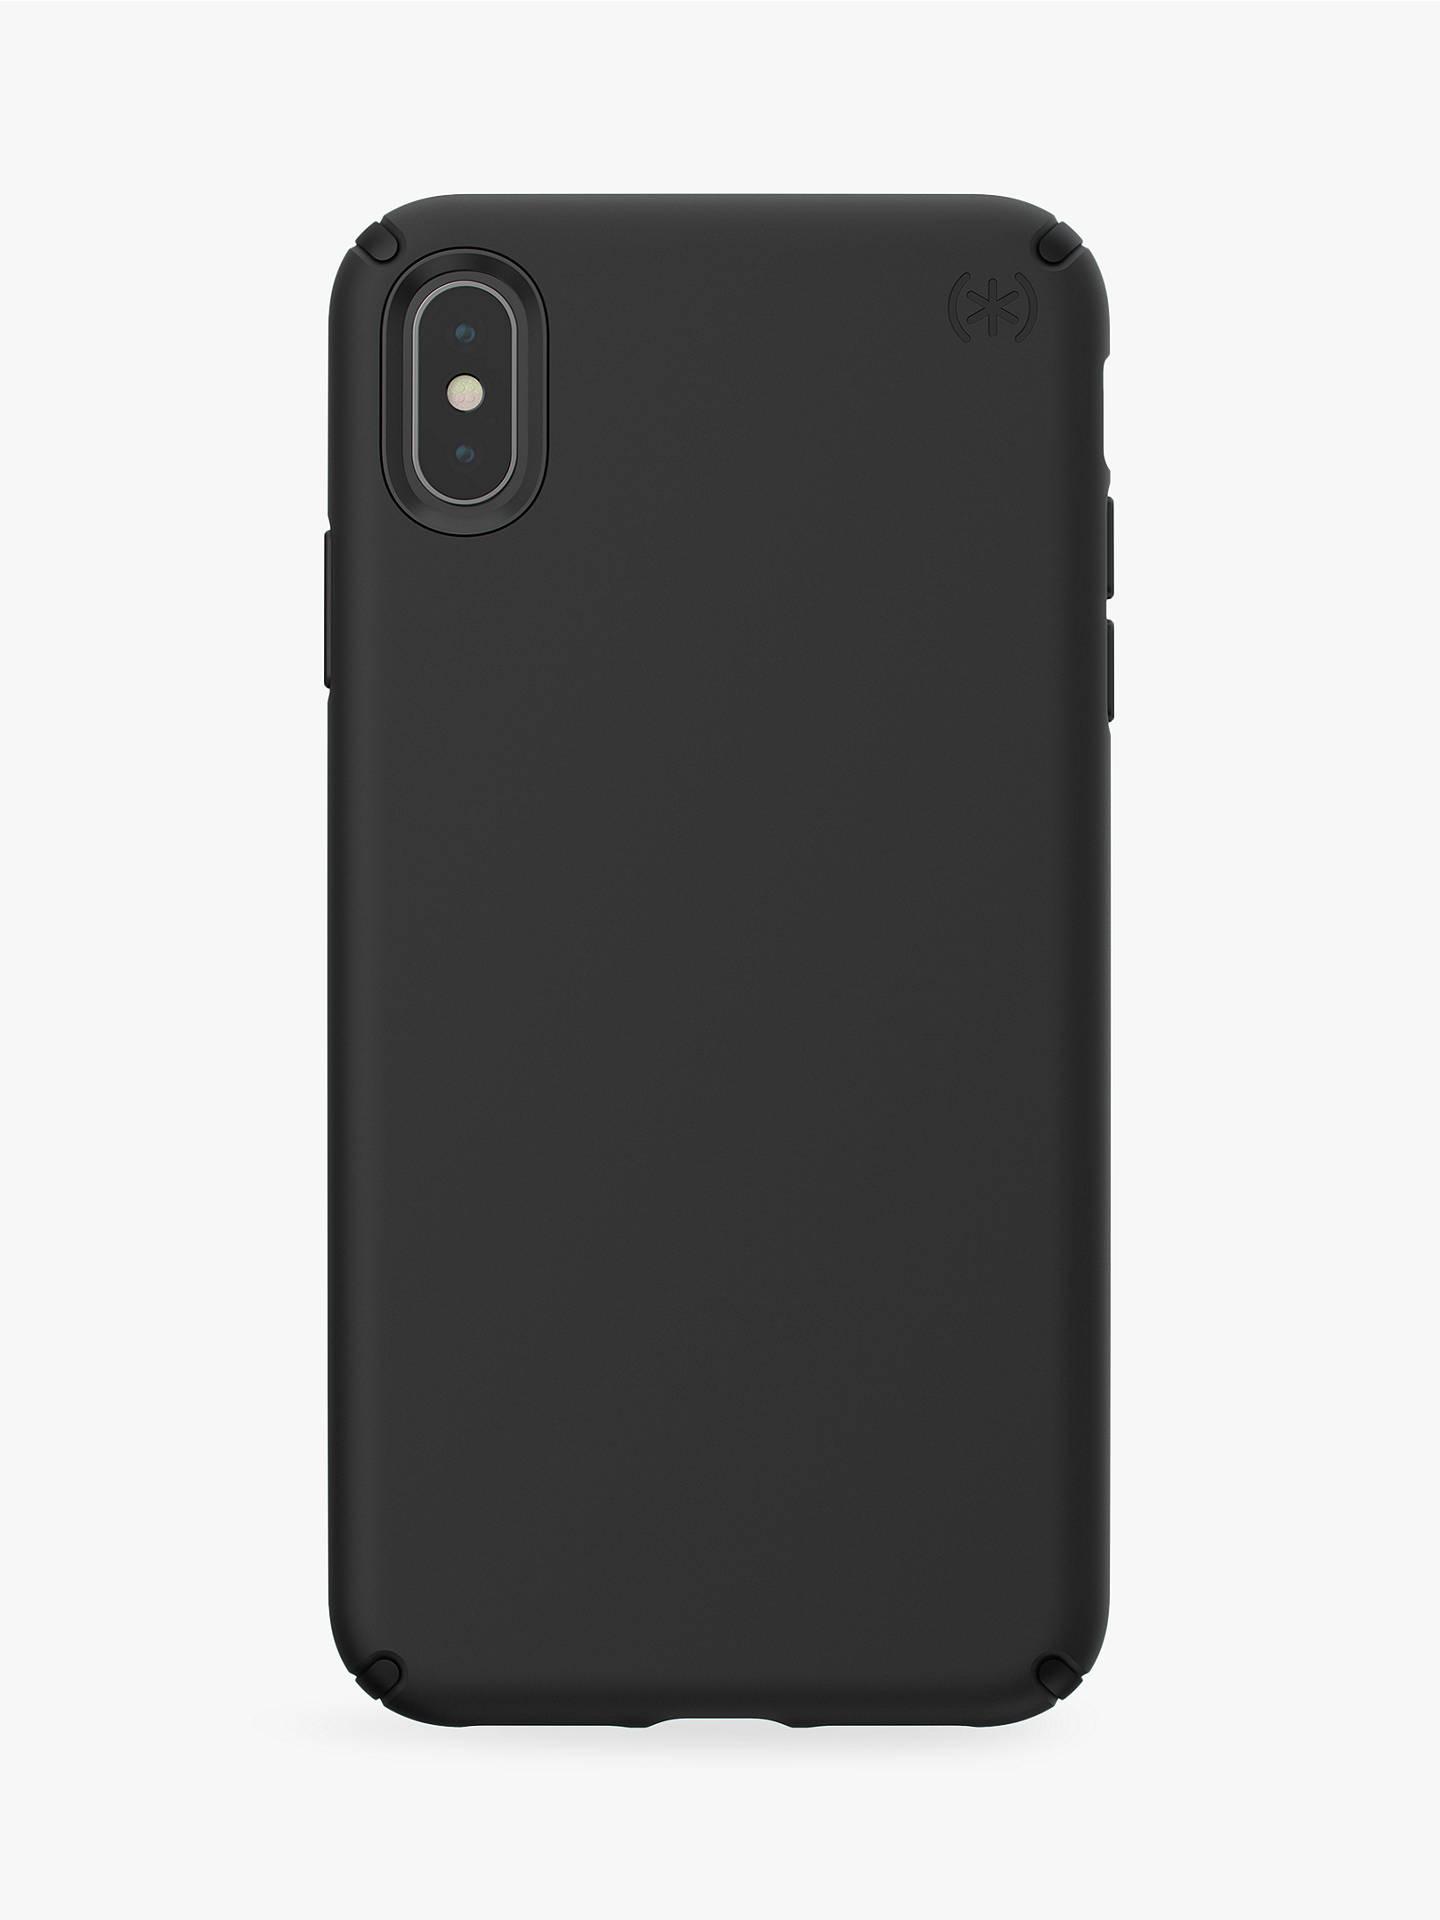 buy popular 31cc6 3fa98 Speck Presidio Pro Case for iPhone XS Max, Black £10 @ John Lewis ...